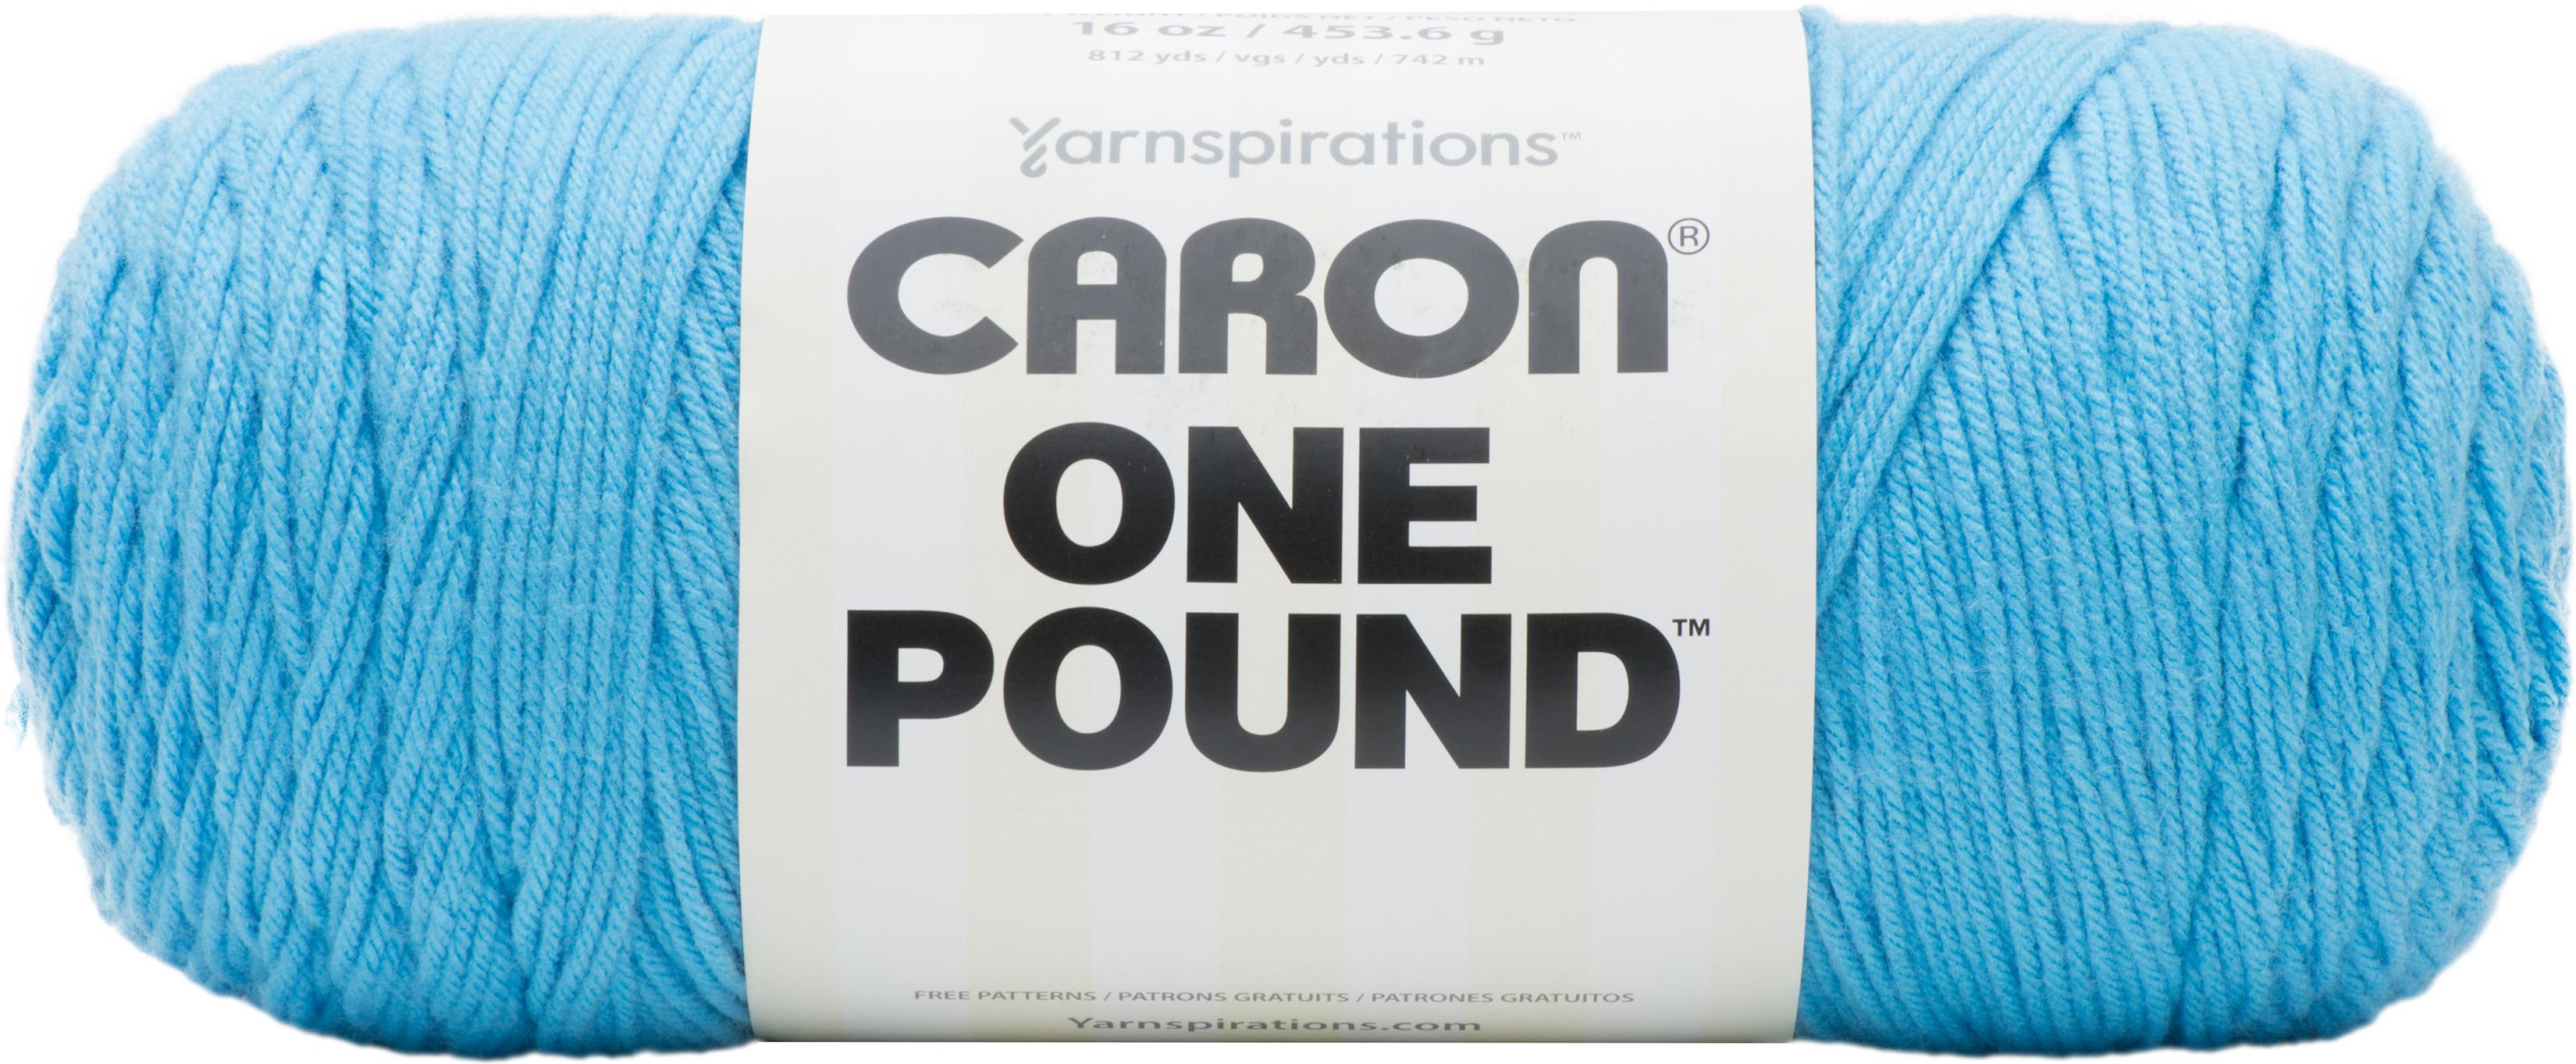 Caron One Pound Century Collection Yarn